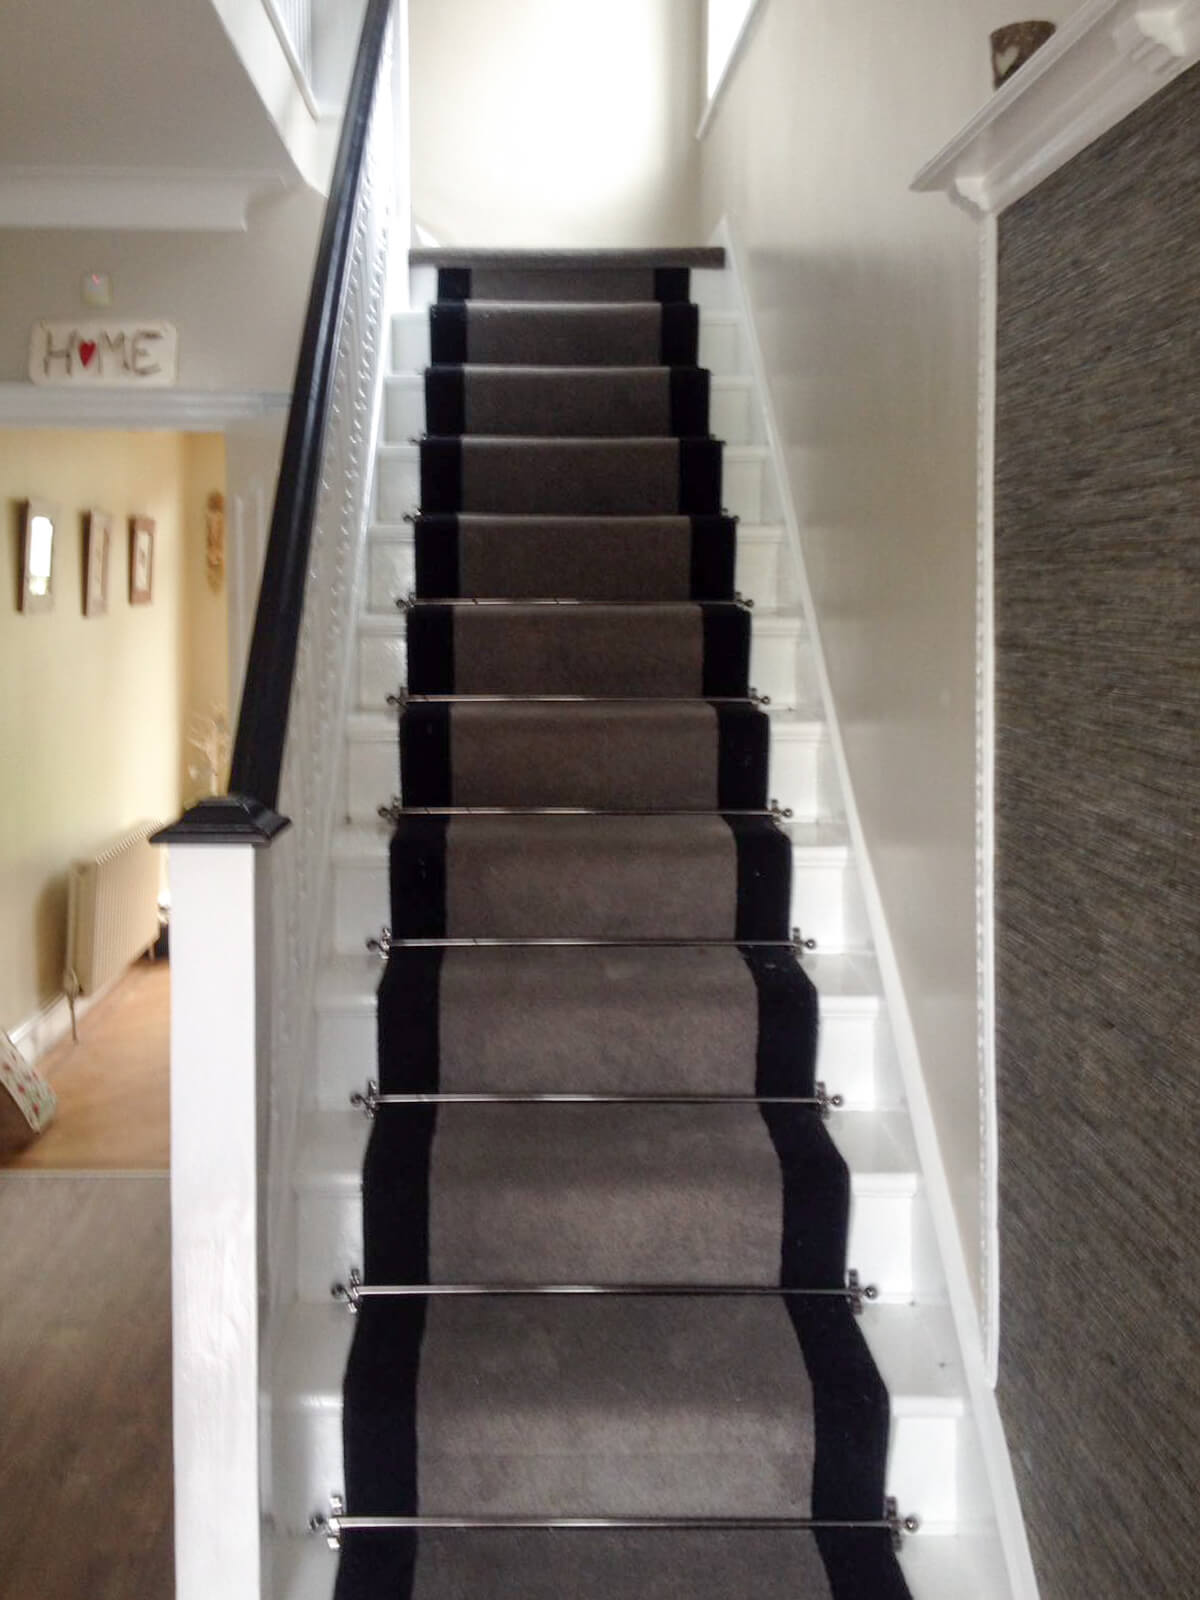 New stair flooring